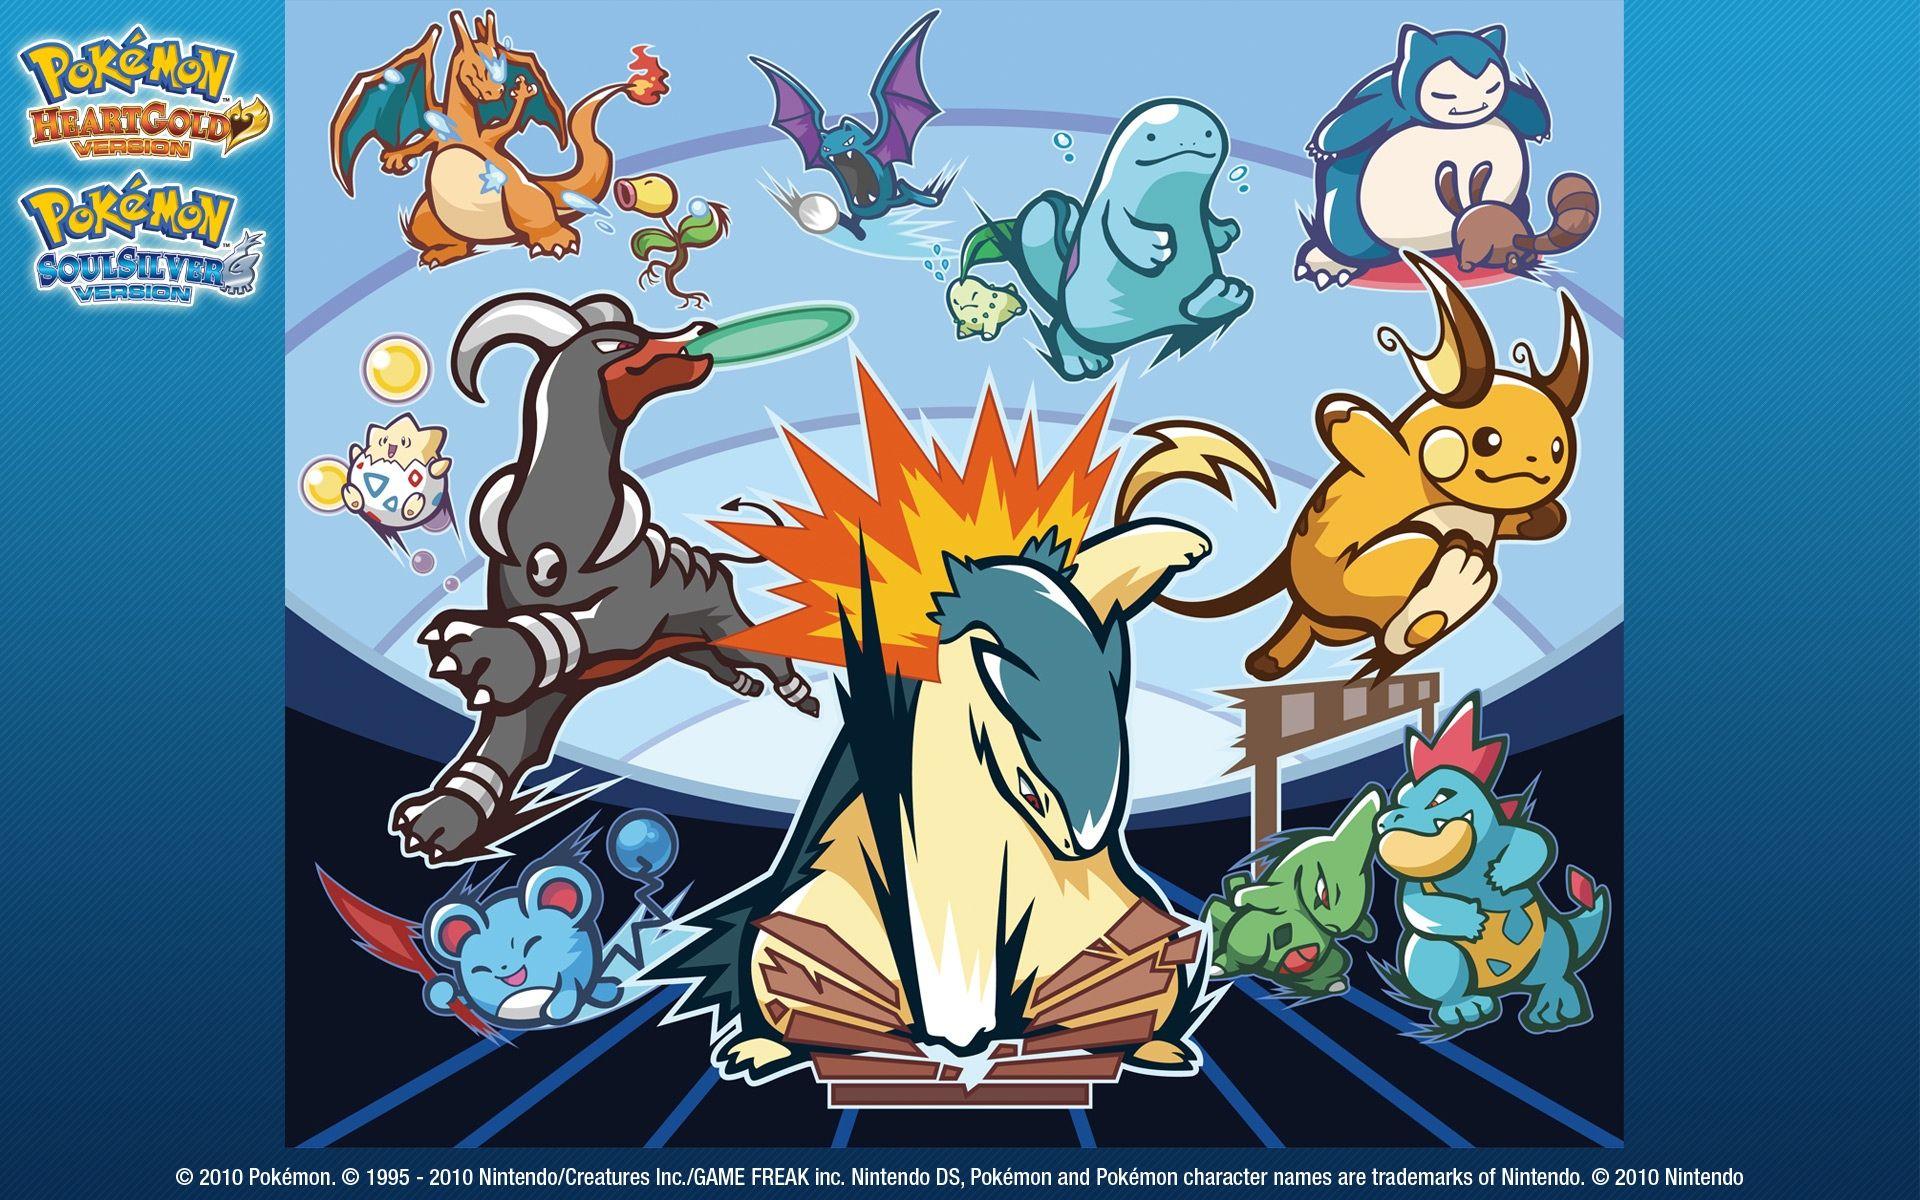 Pokemon Heartgold And Soulsilver Wallpaper Pokemon Pokemon